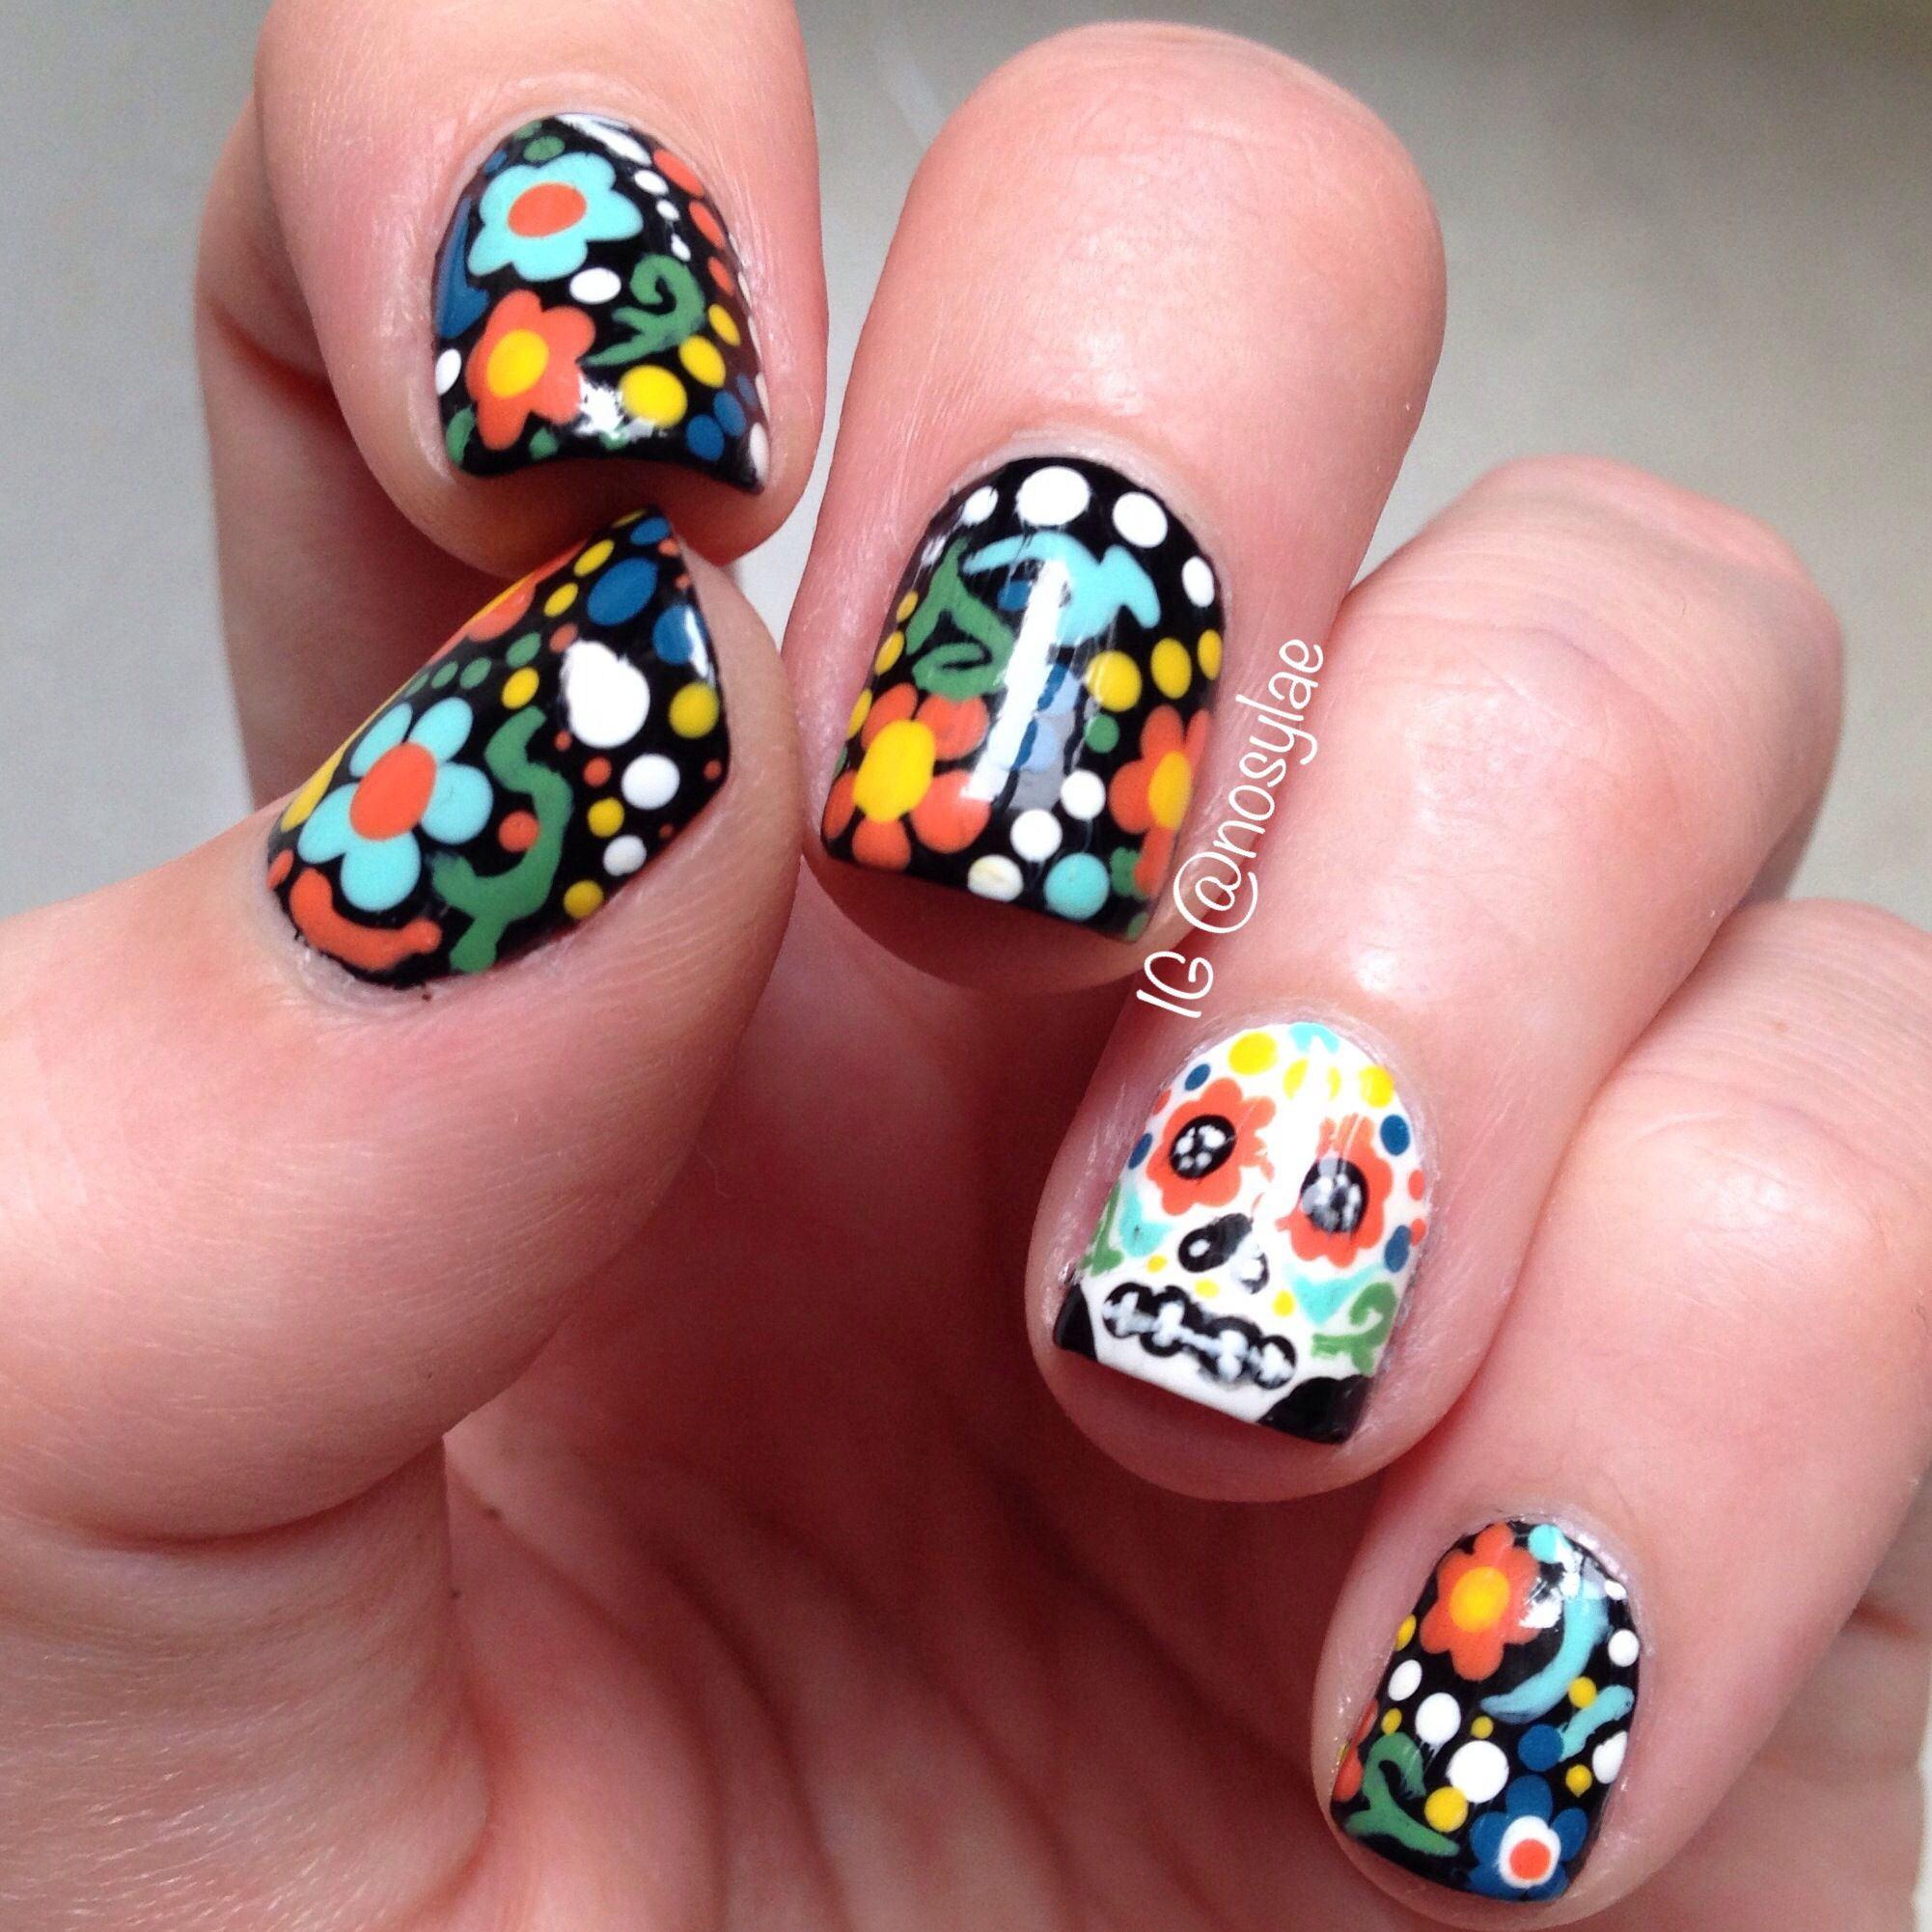 Sugar skull nail art. Inspired by starfish-onthe-beach.blogspot.com ...